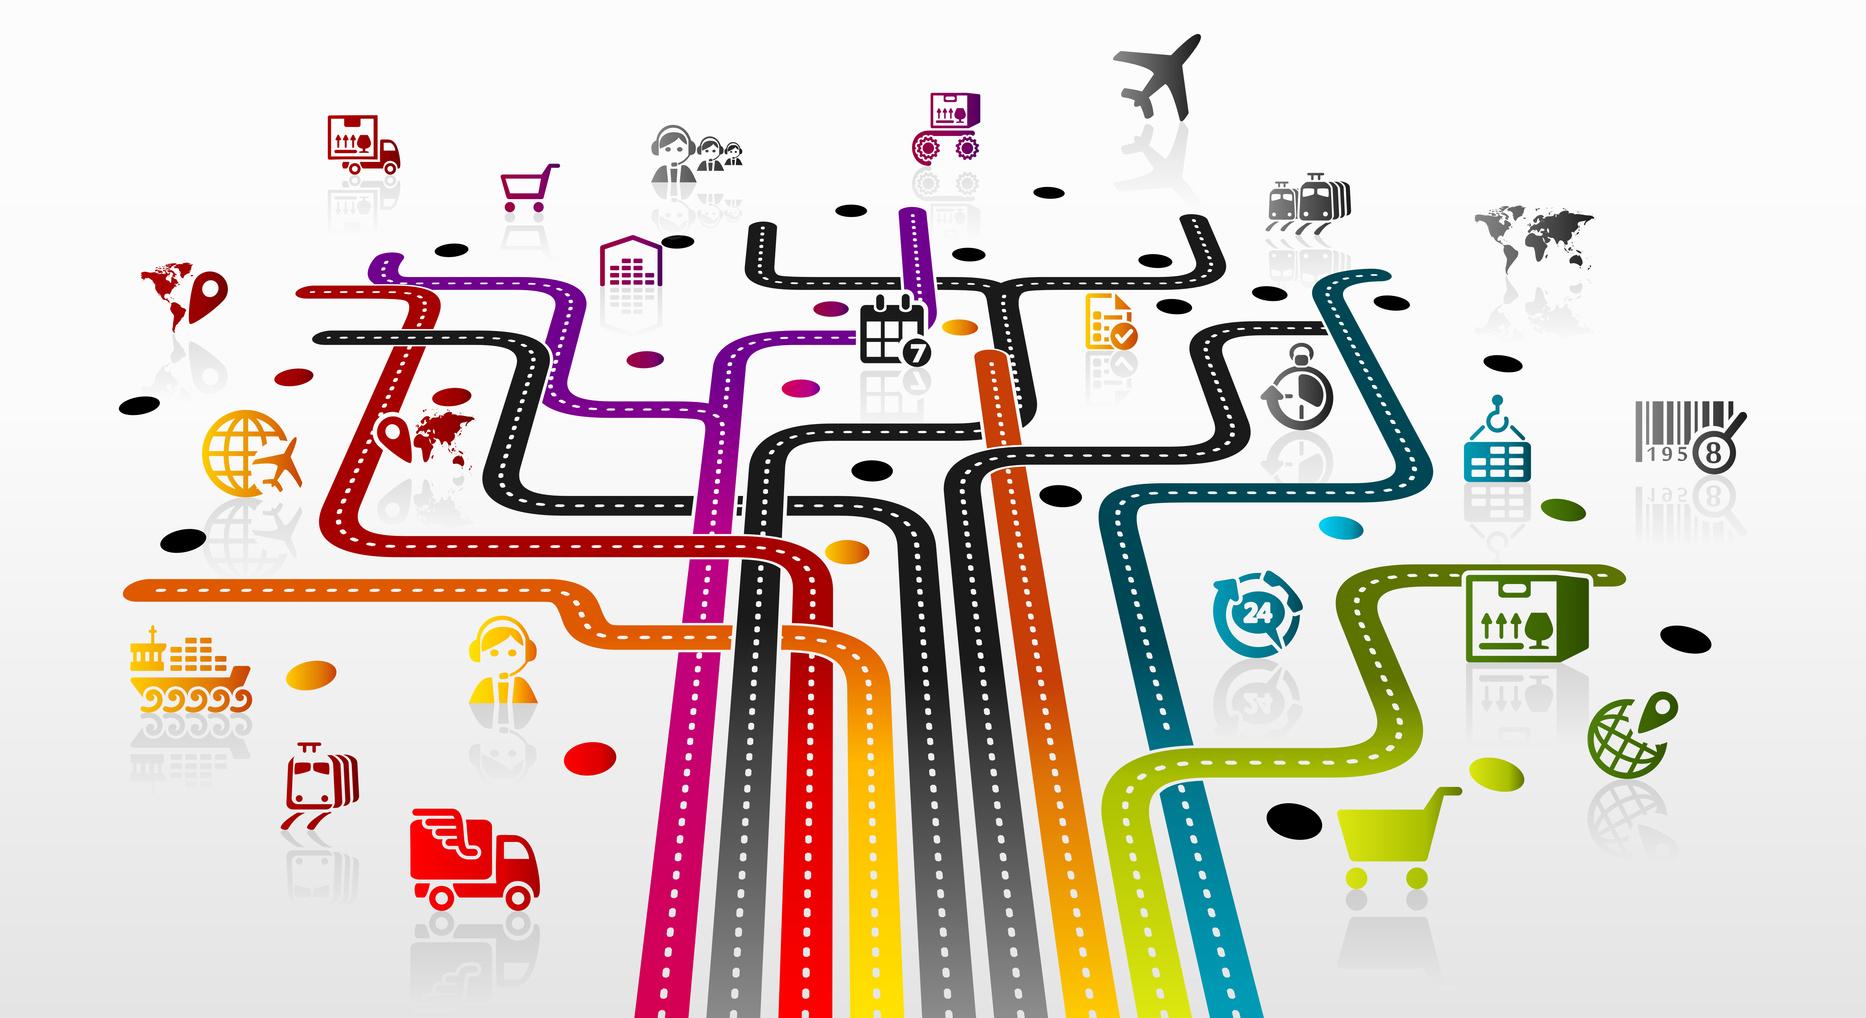 �нтернет вещей и логистика, ч. 1: понимание и влияние IoT на логистику